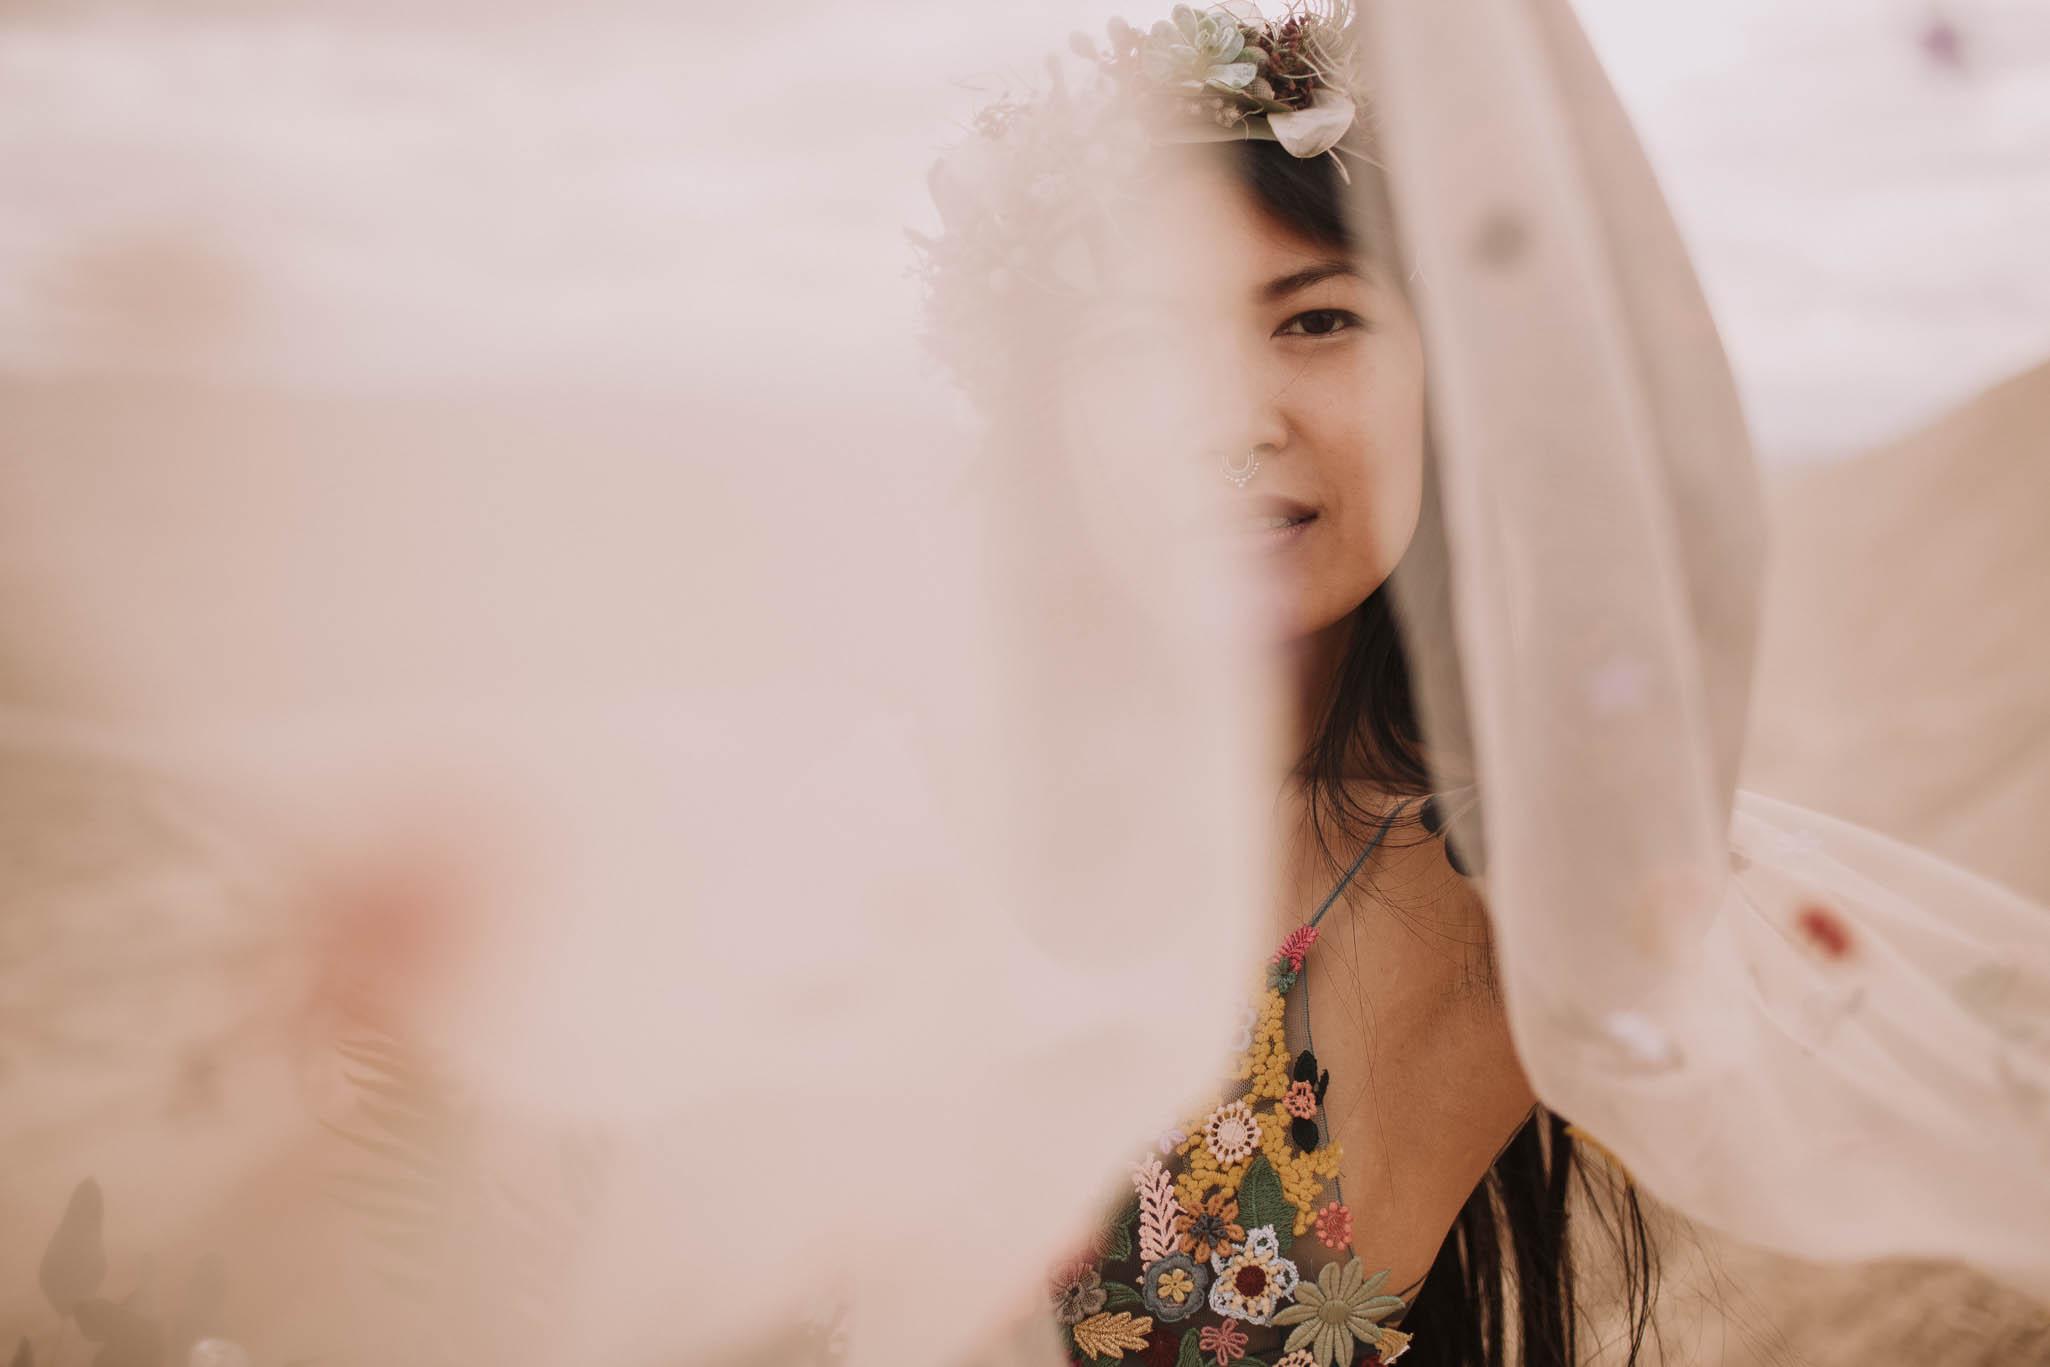 Spain-wedding-photographer-bardenas-reales-jeremy-boyer-photographe-mariage-bordeaux-floral-wedding-dress-robe-120.jpg